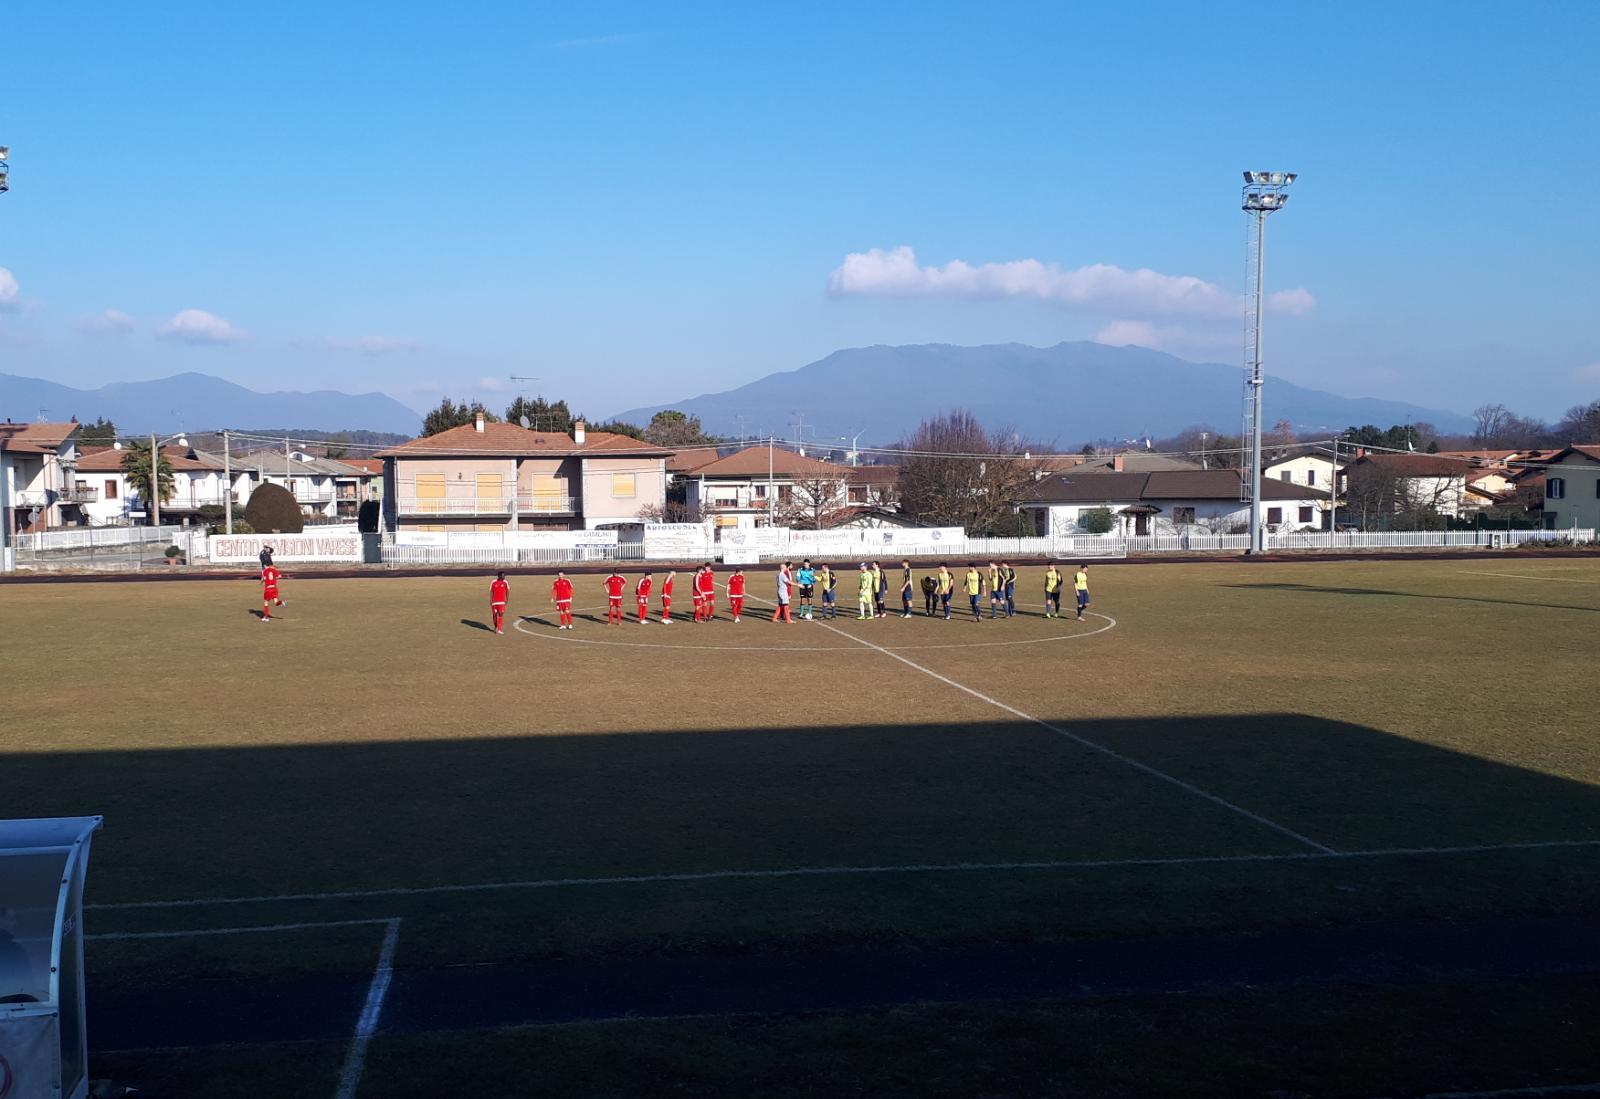 17^ giornata – Beffa Vanzaghellese, Folgore Legnano in vetta. Bene Gorla e Cantello Belfortese